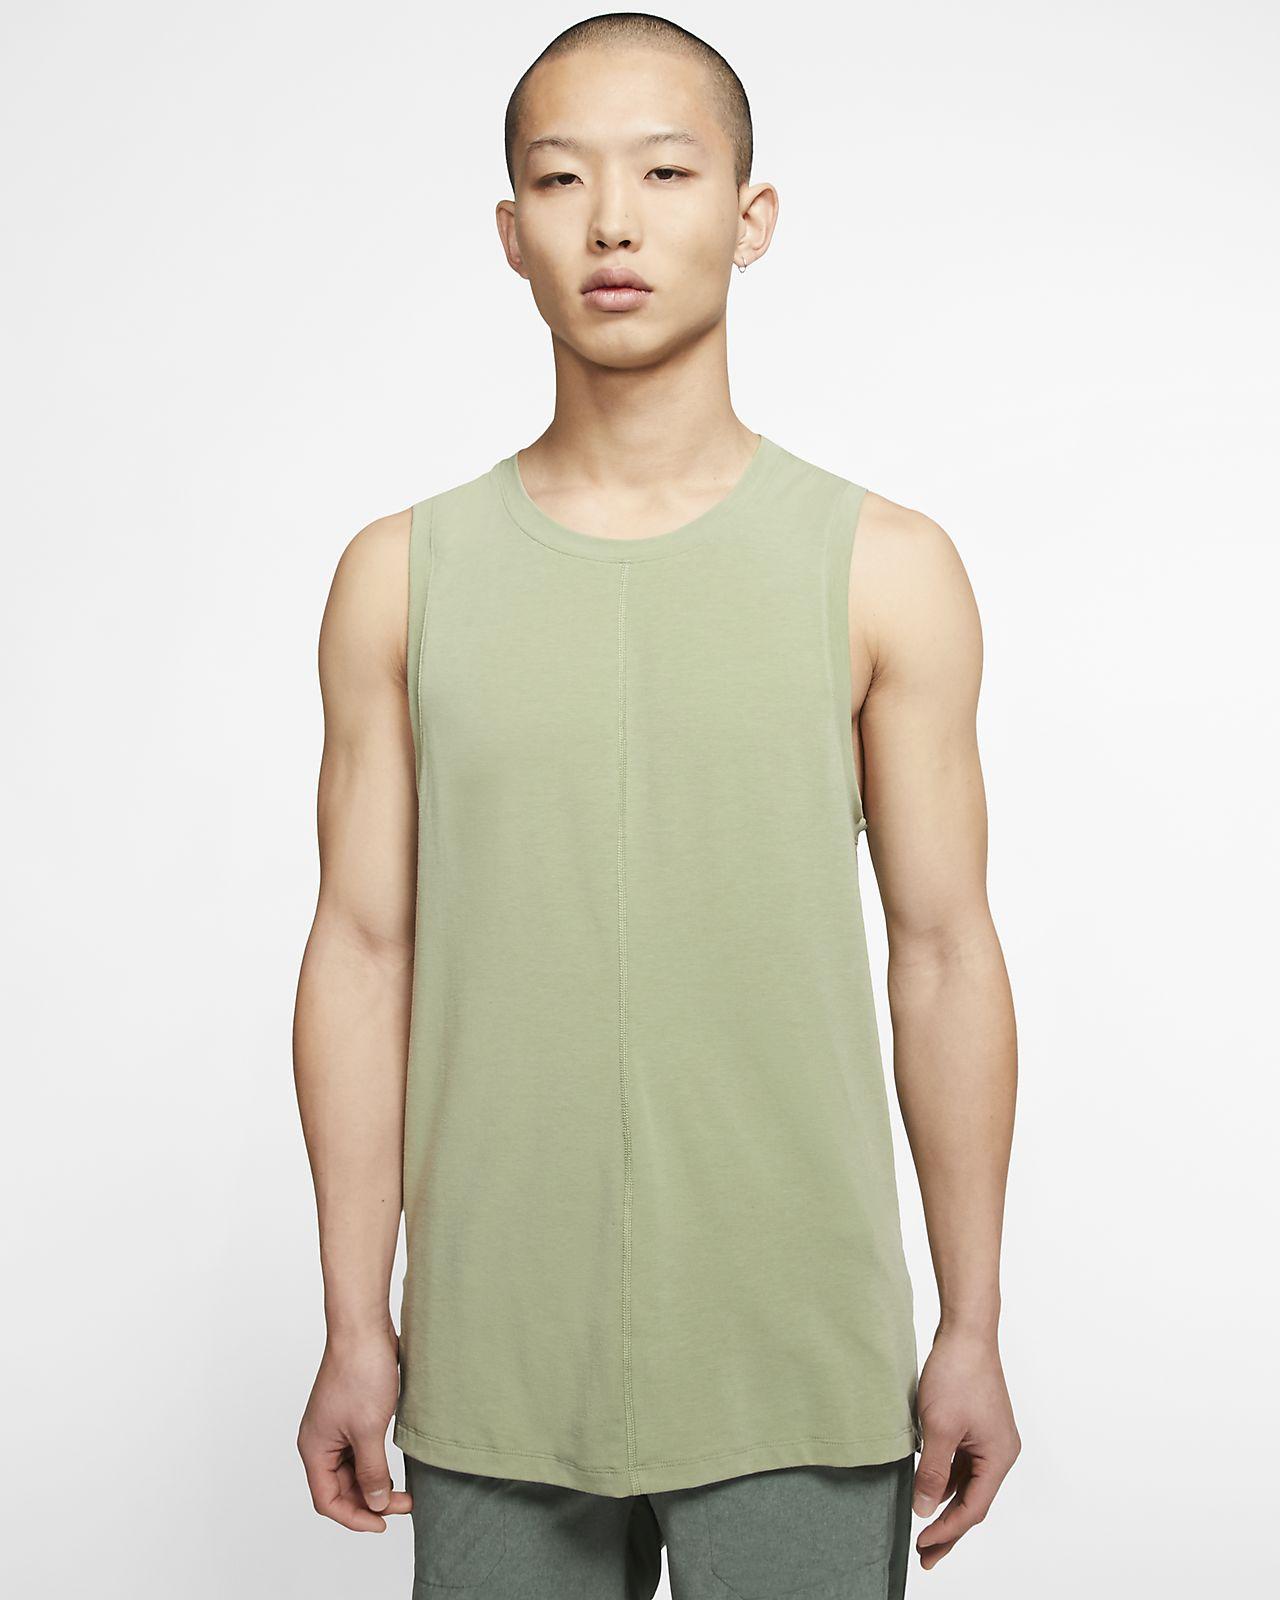 Nike Yoga 男款背心